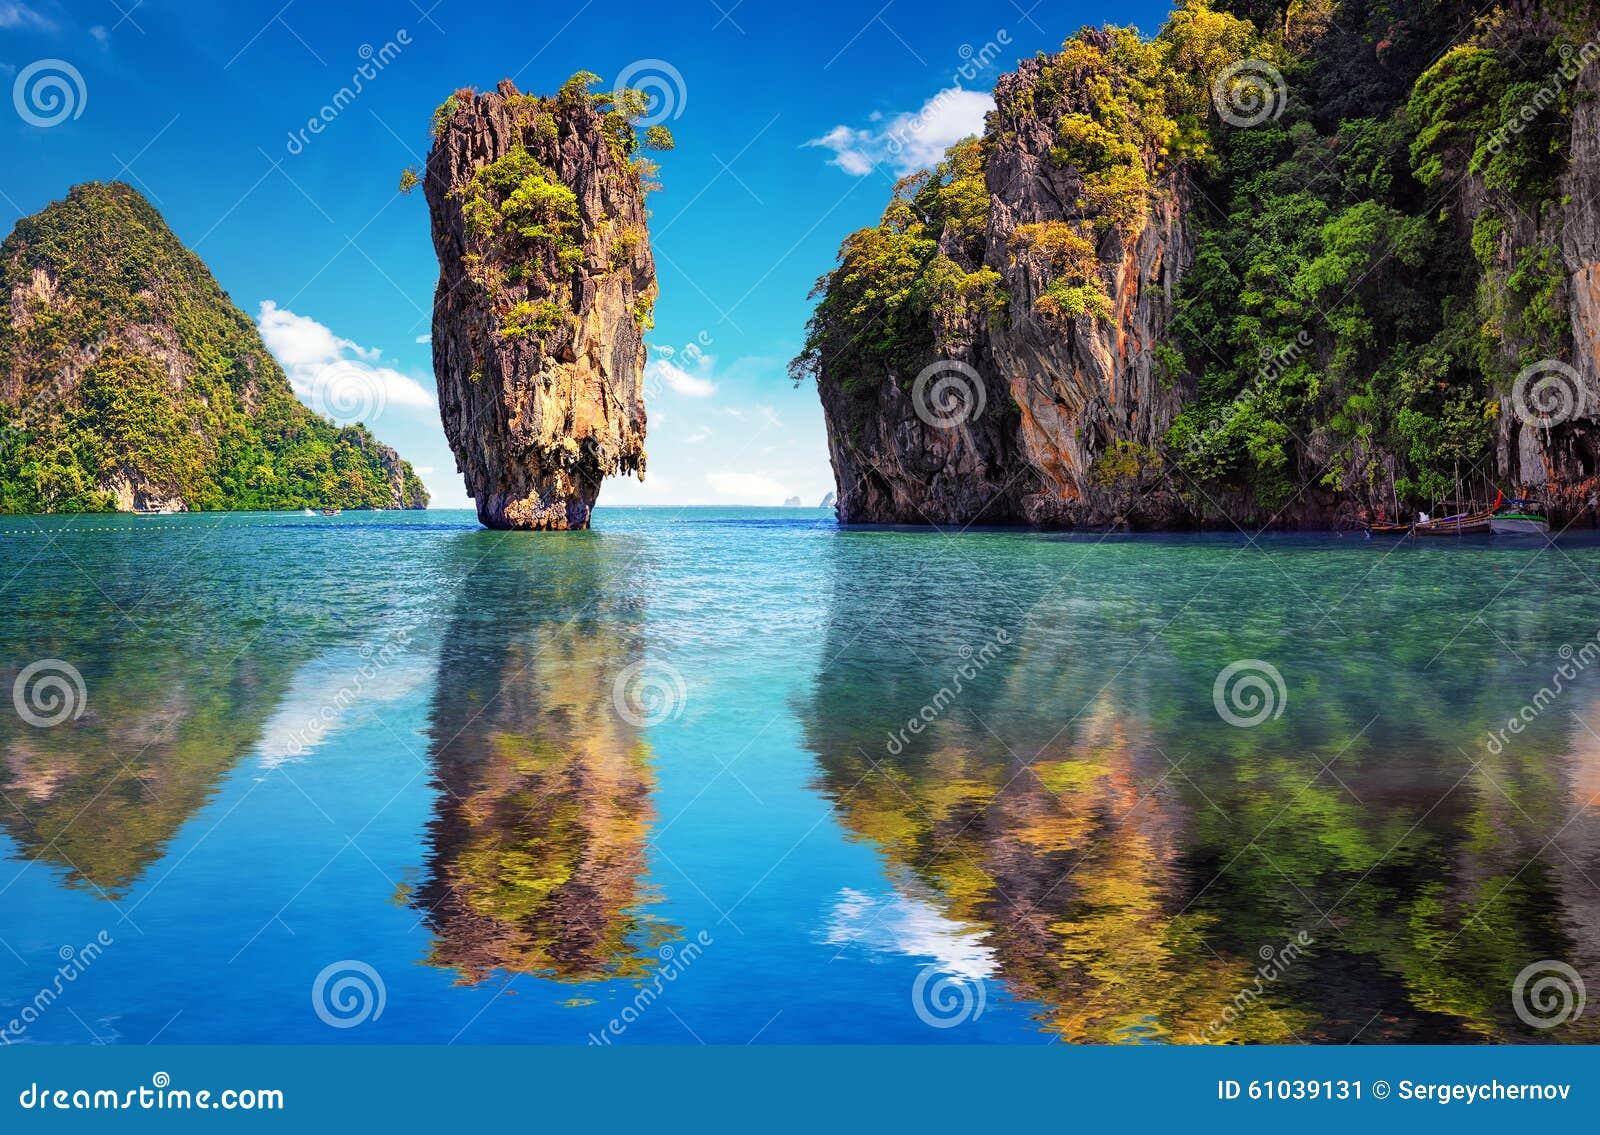 Nature Images 2mb: Beautiful Nature Of Thailand. James Bond Island Reflection